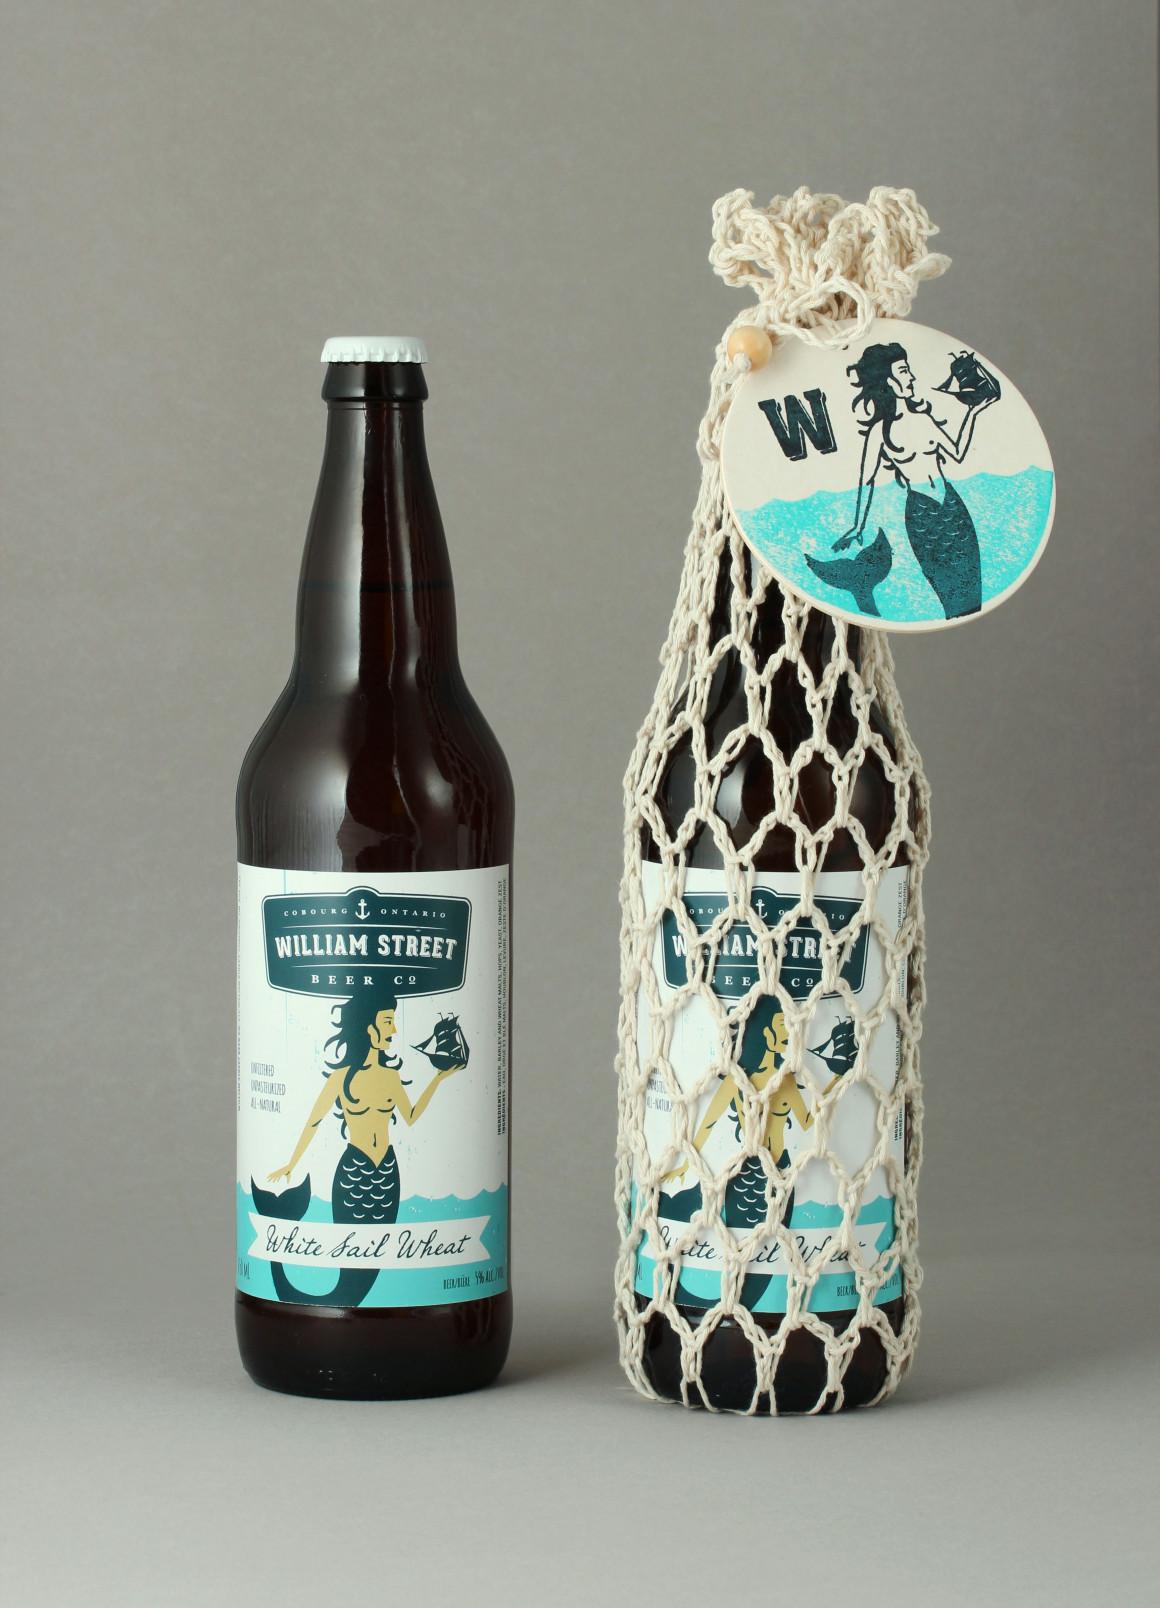 William Street Beer Co. package design –Luke Despatie and The Design Firm